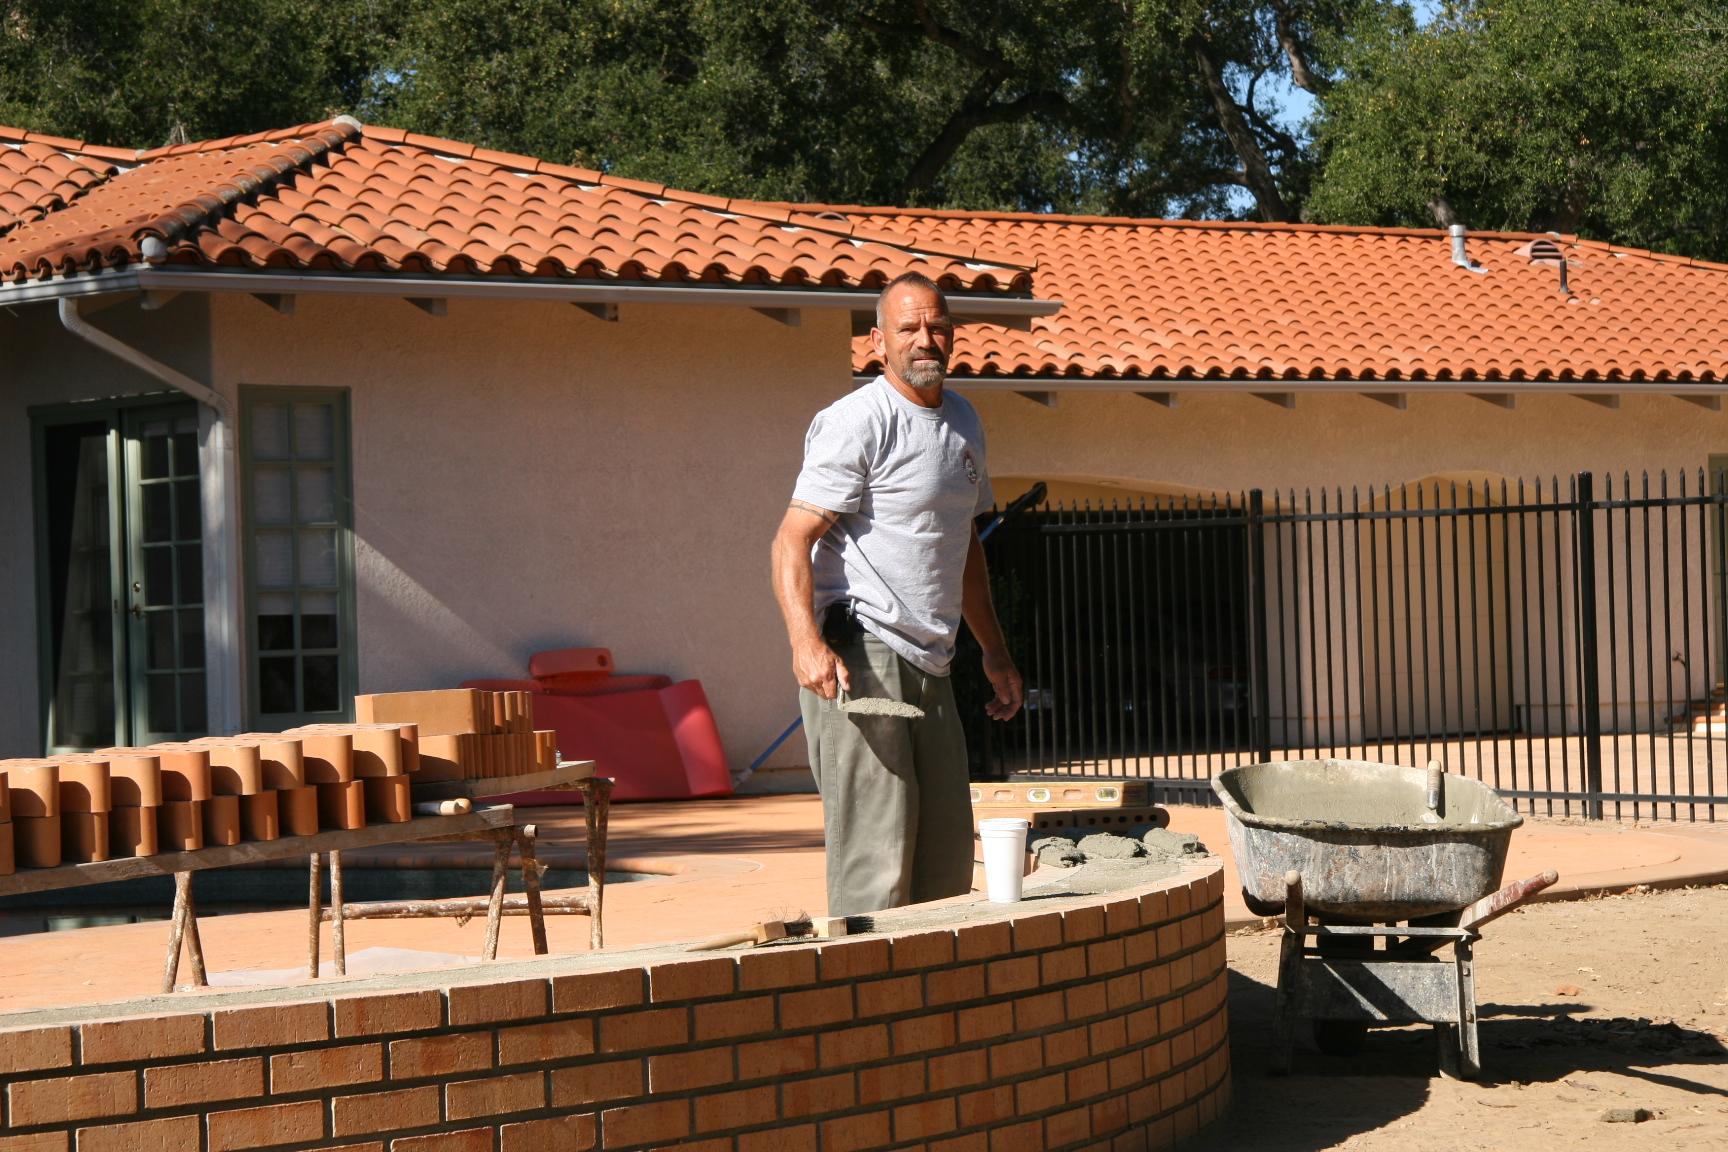 Brick 171 Rose Masonry And Concrete